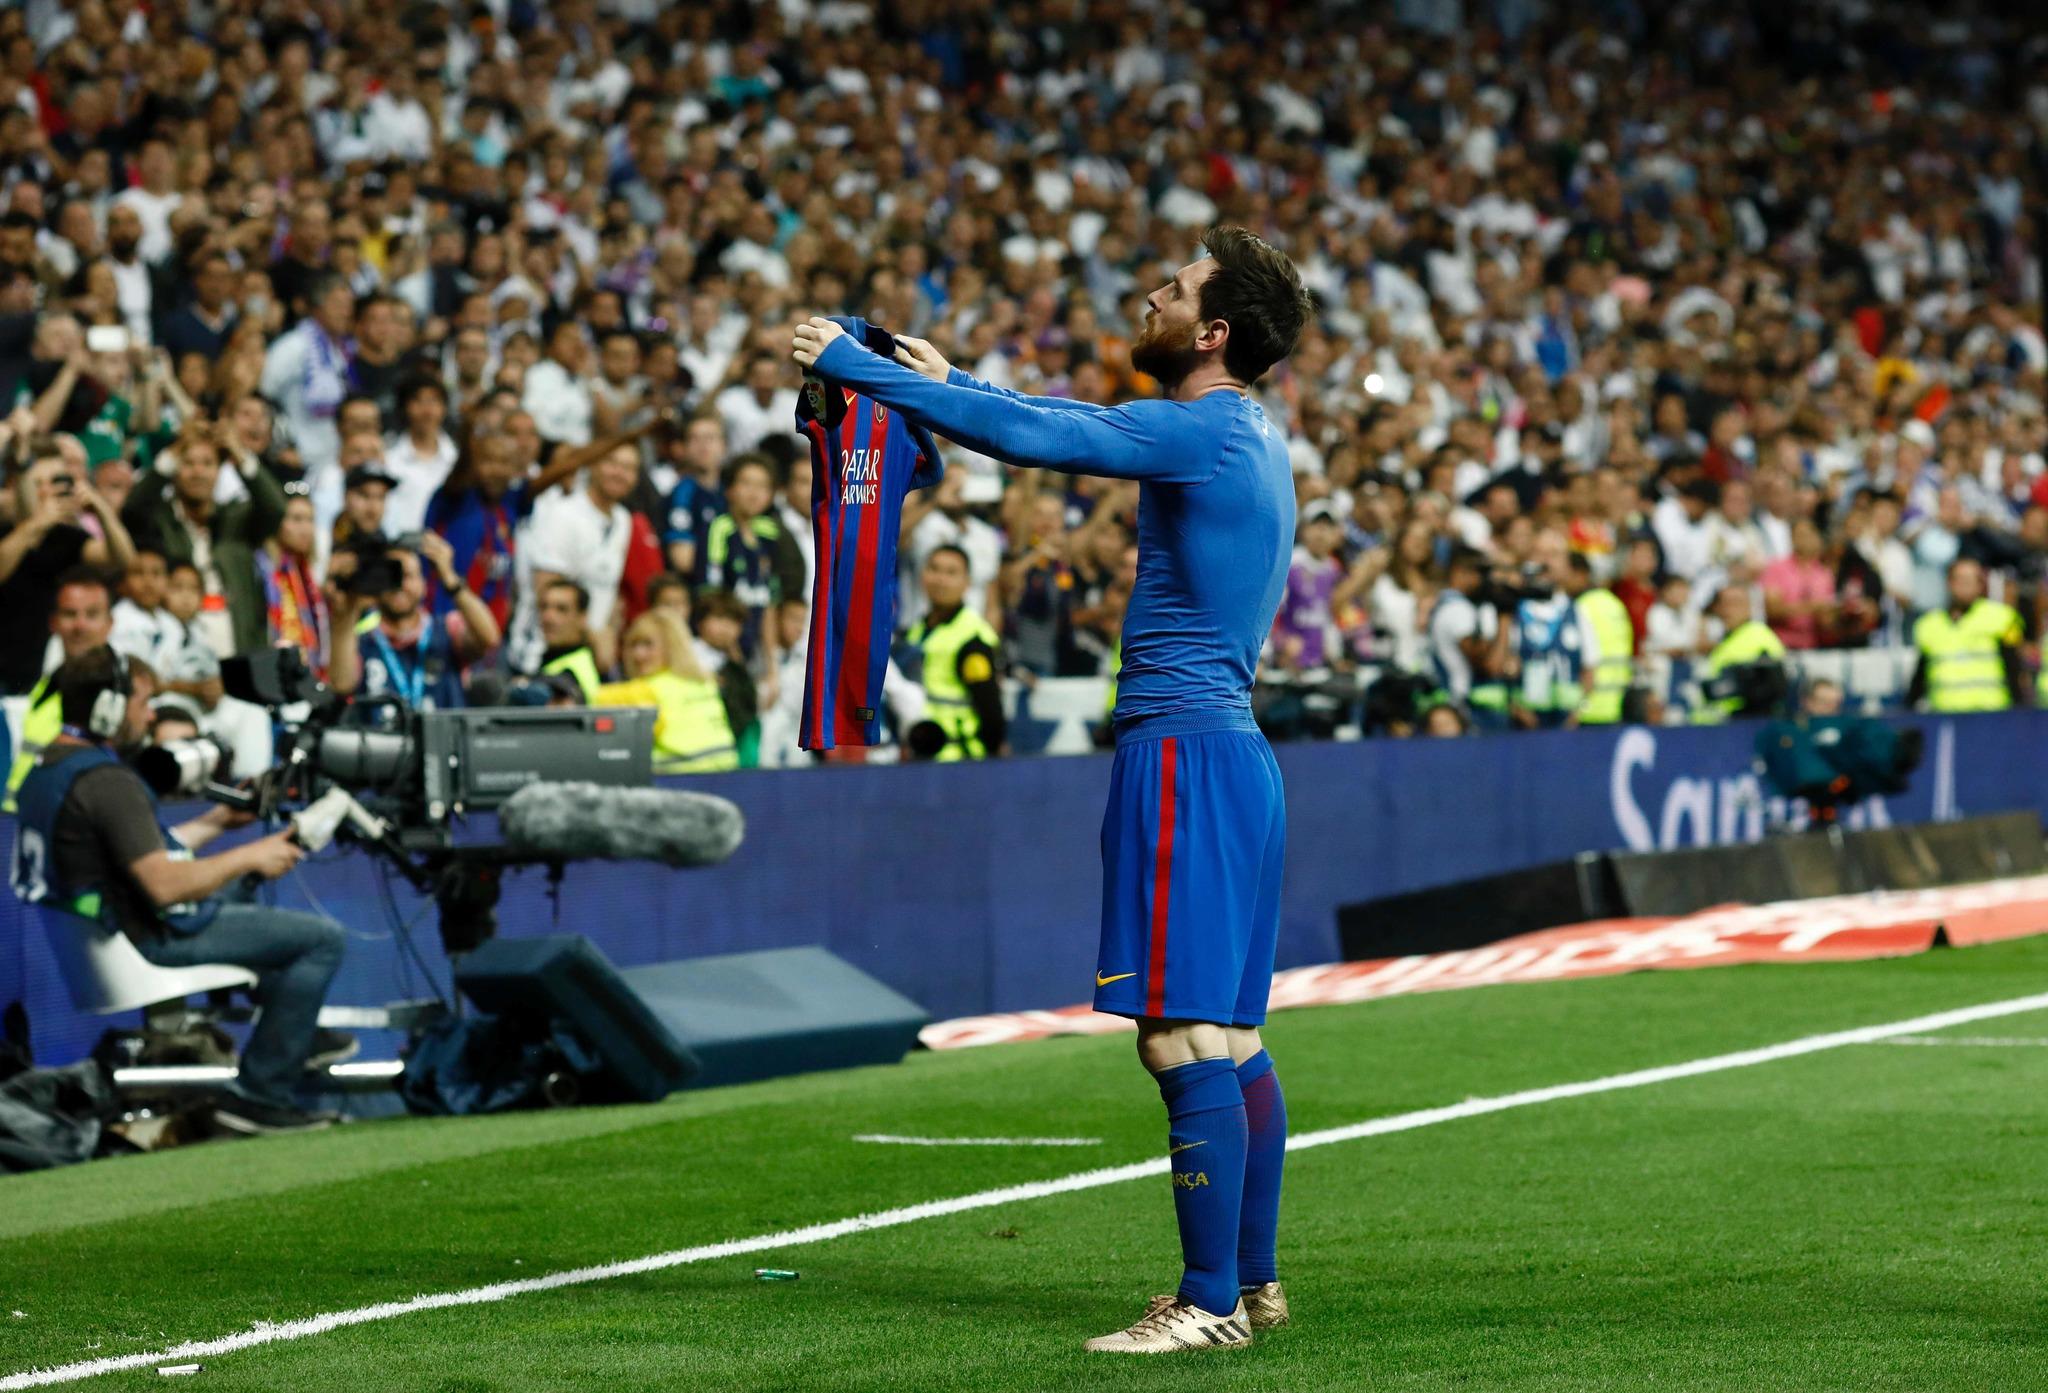 Messi pone la liga al rojo vivo en el Bernabeu.